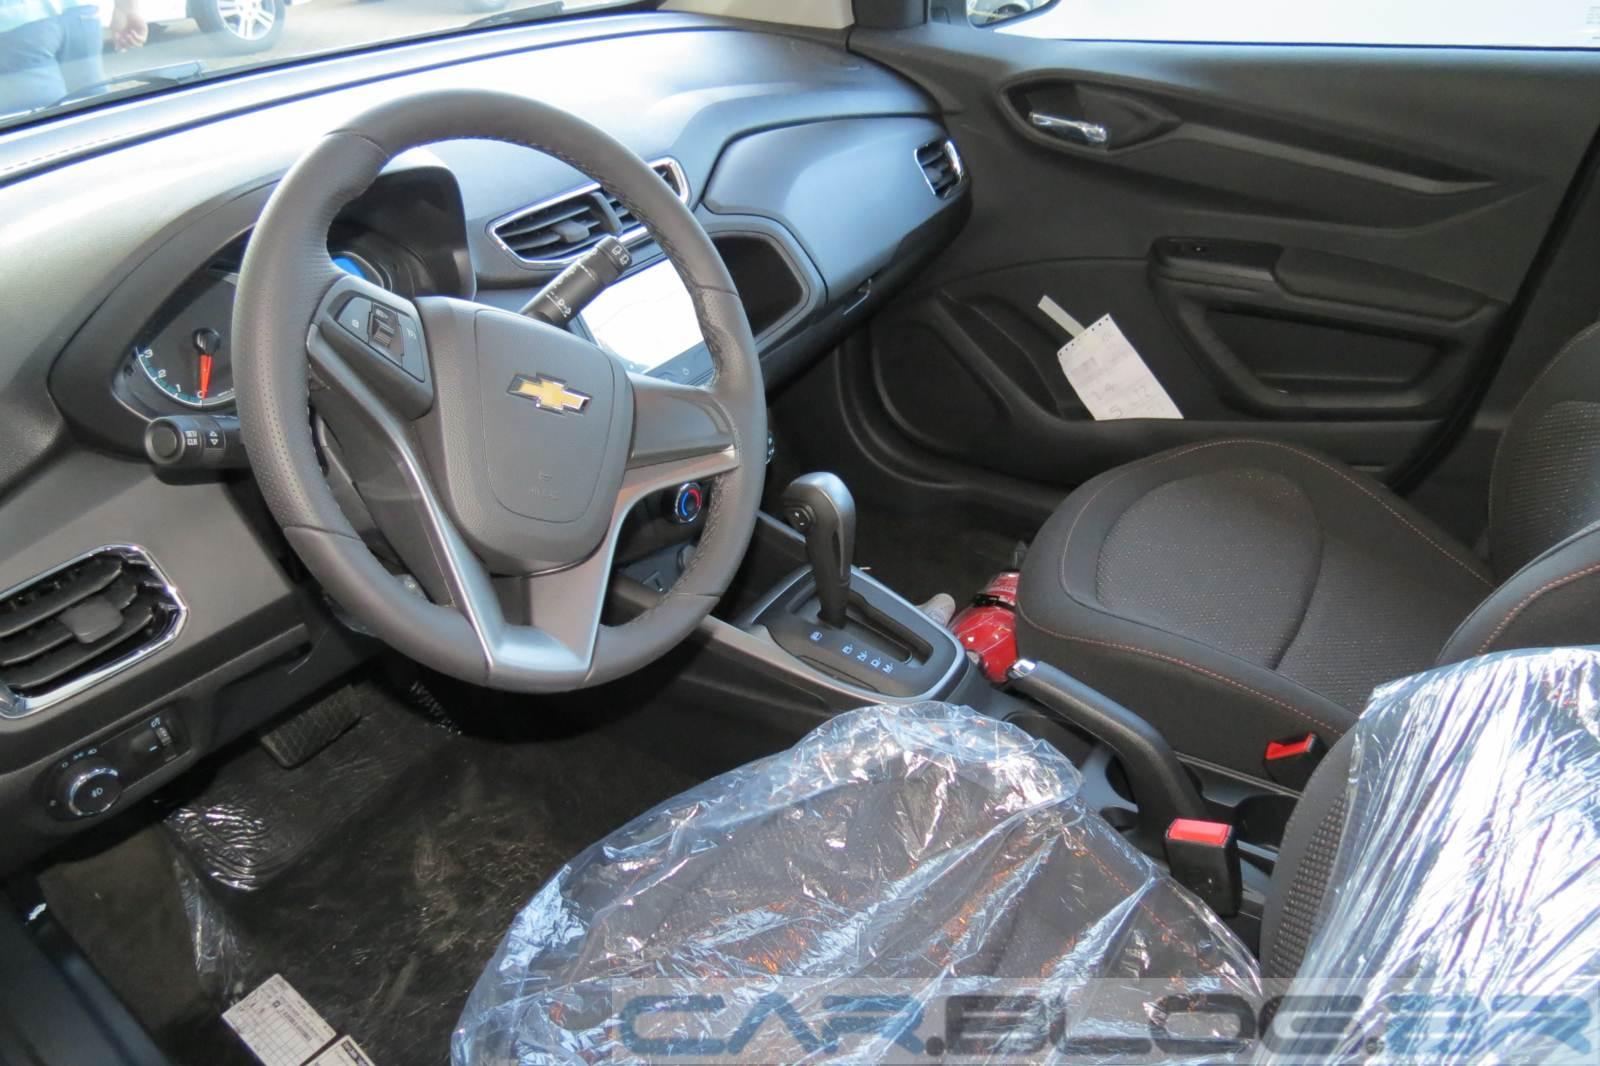 Chevrolet Onix LTZ 2015 - interior